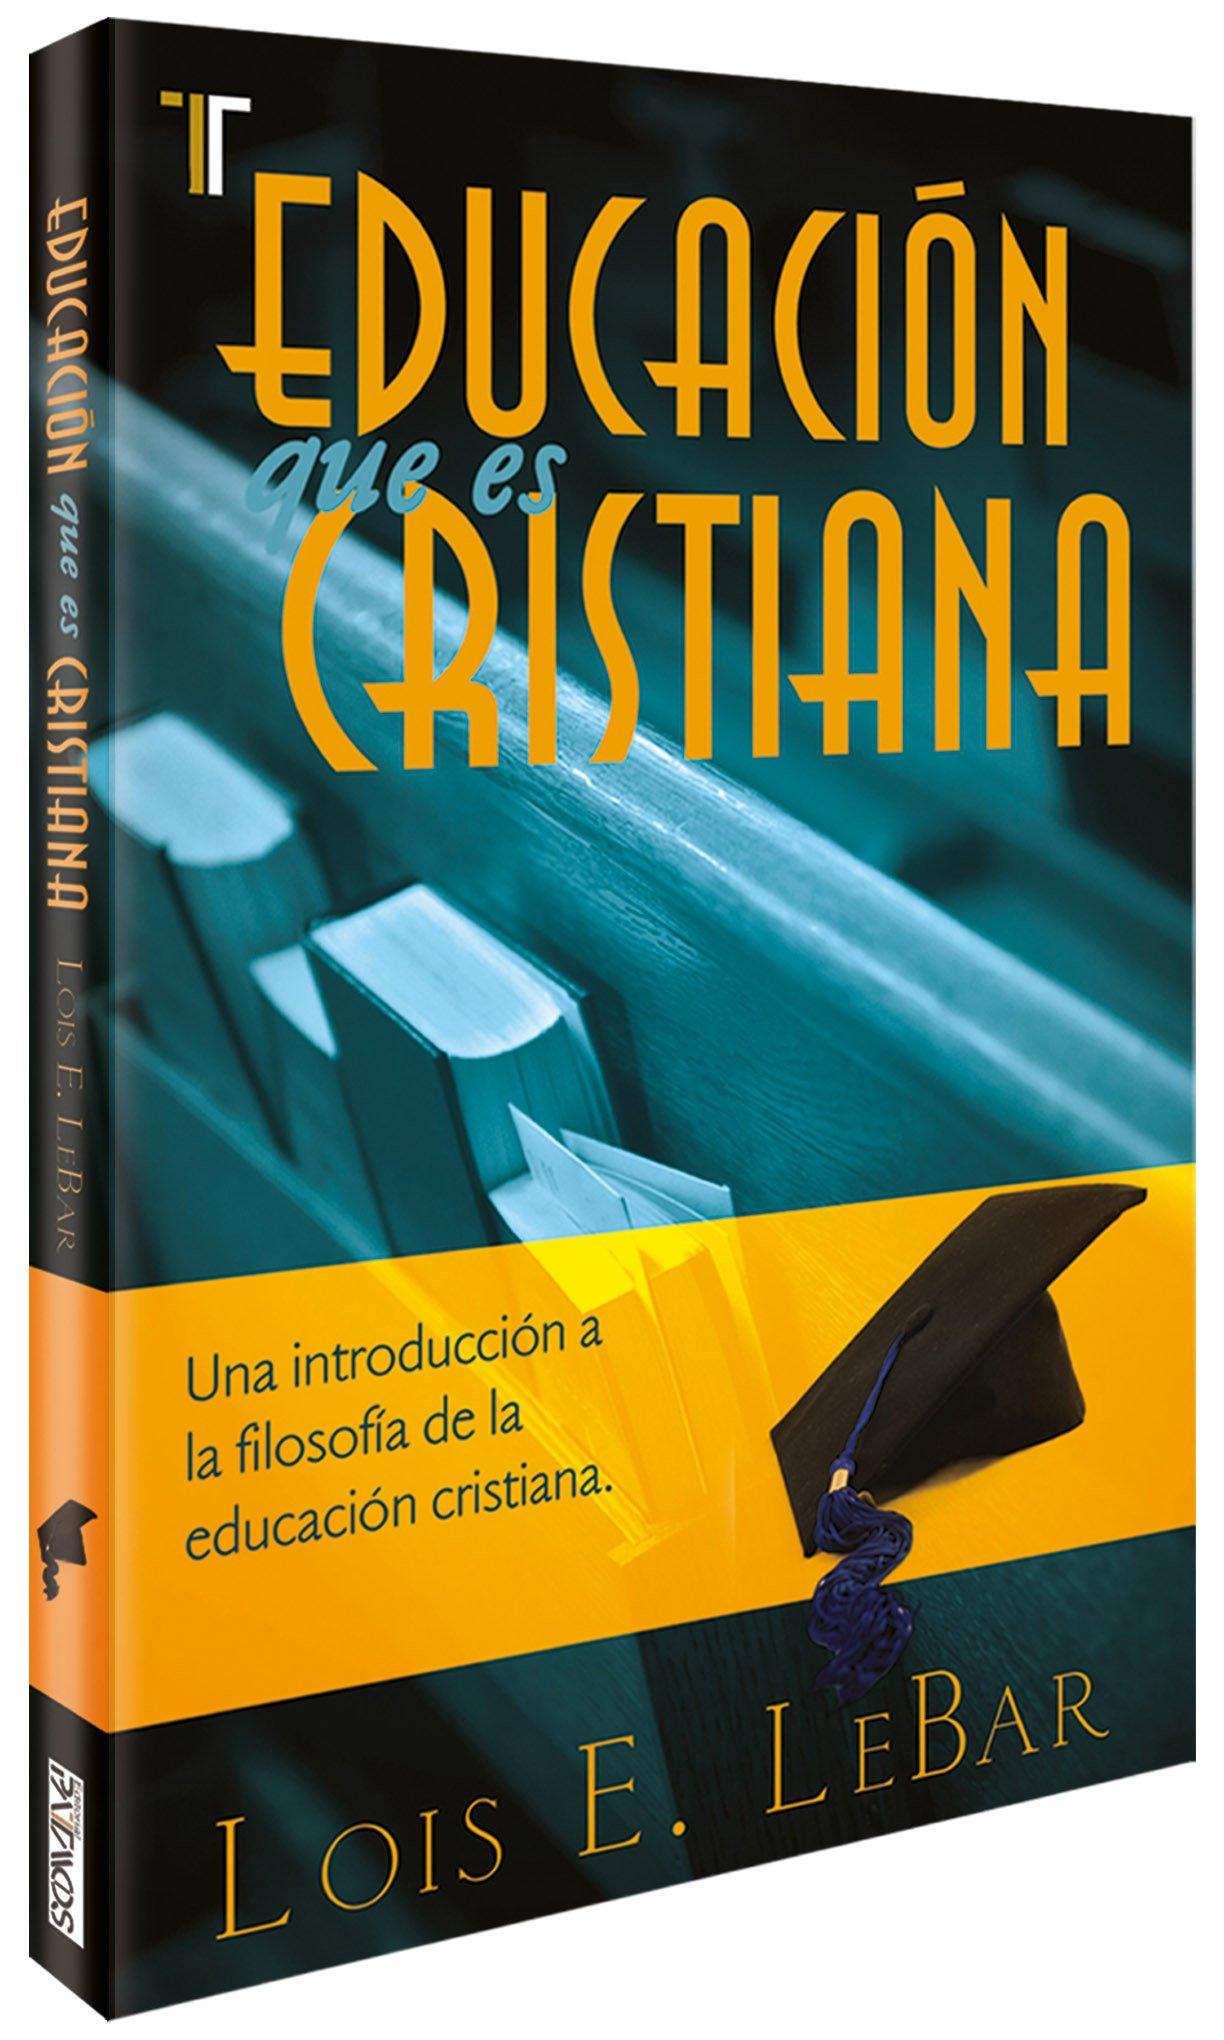 ... Cristiana: Una Introduccion a la Filosofia de la Educacion Cristiana: Amazon.es: Lois Lebar, Kerstin Anderas-Lundquist, Agneta Anderas-Solgevik: Libros